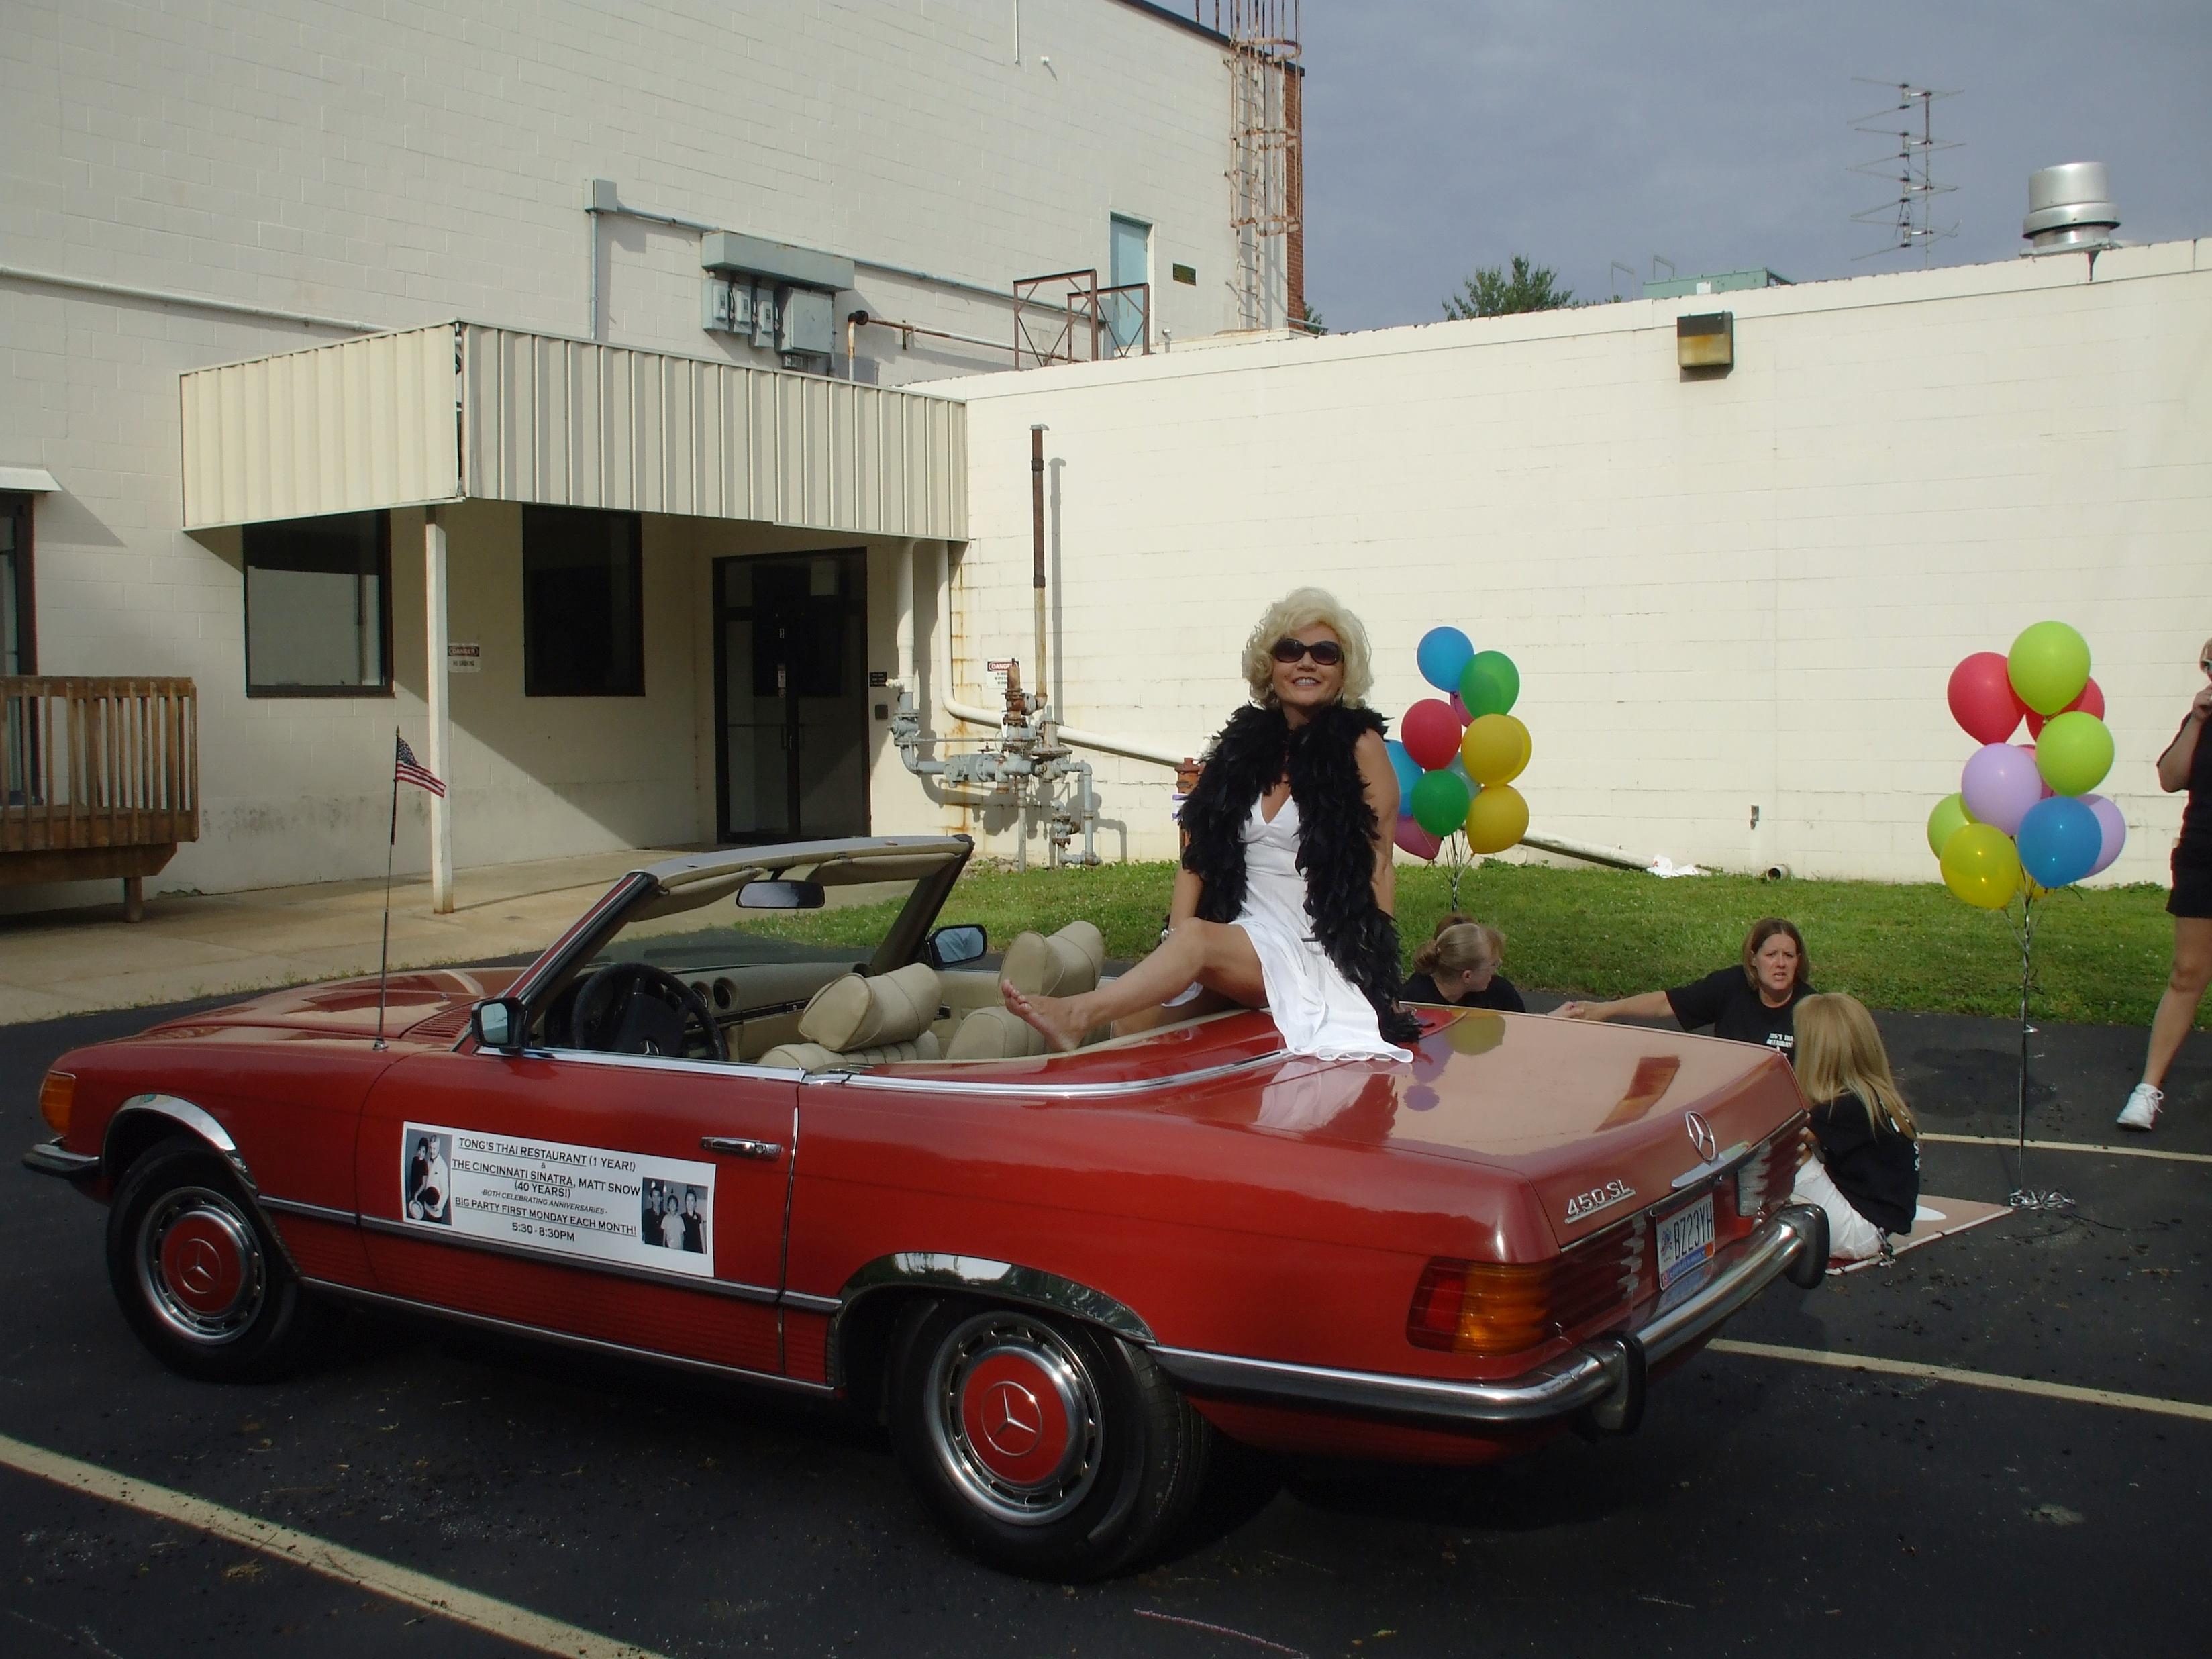 Marilyn gives 'em a little leg at parade 1